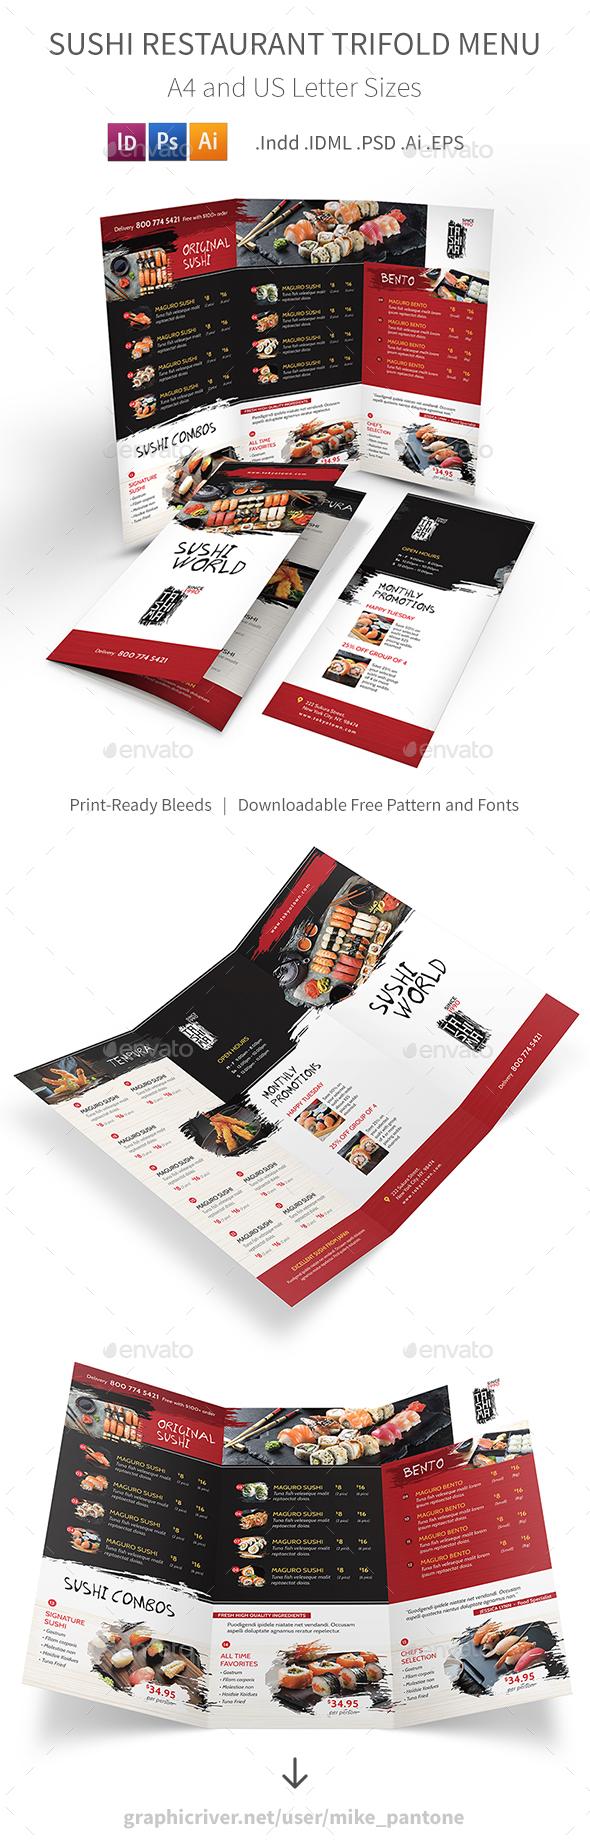 GraphicRiver Sushi Restaurant Trifold Menu 21156795